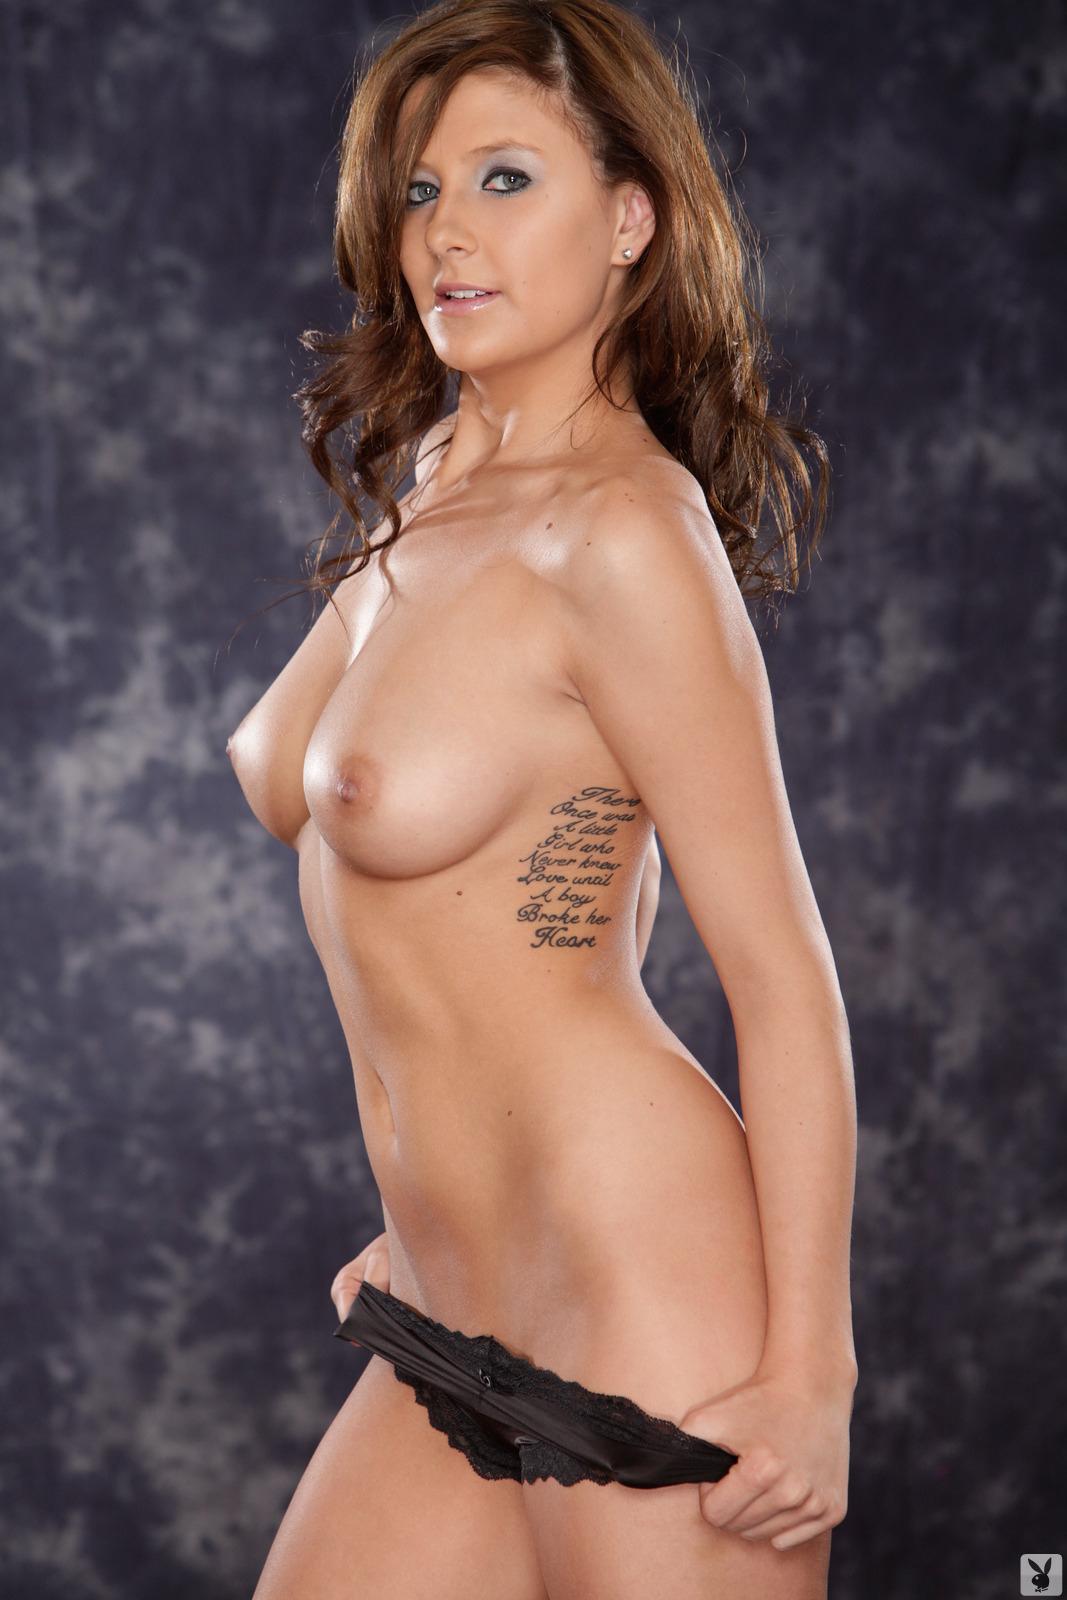 Playboy casting calls columbus nicole lara co 9